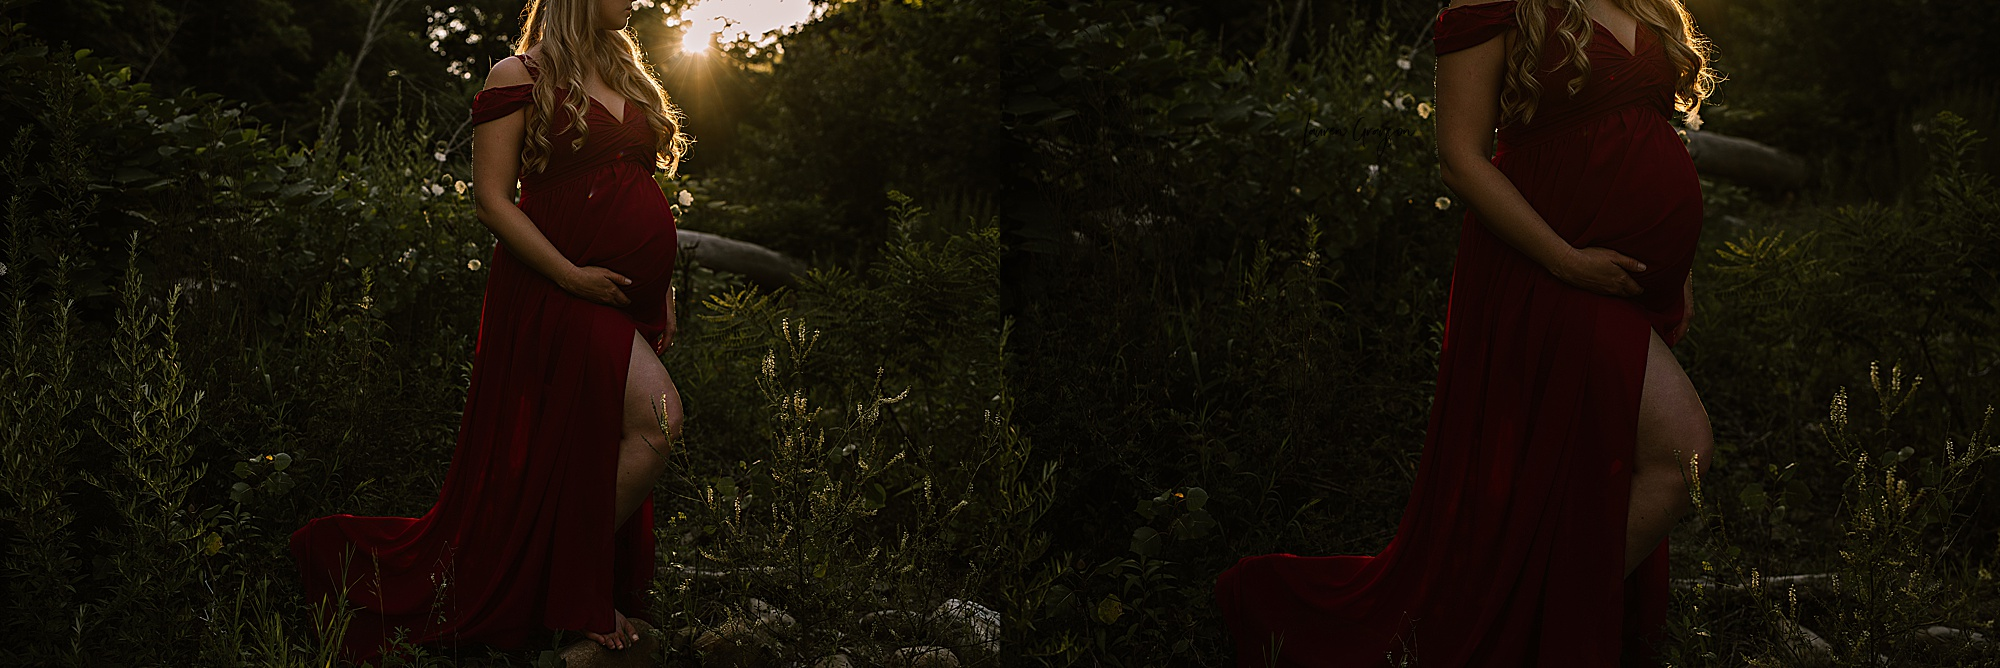 lauren-grayson-photography-akron-ohio-maternity-photographer-waterfall-sarah-f_0015.jpg